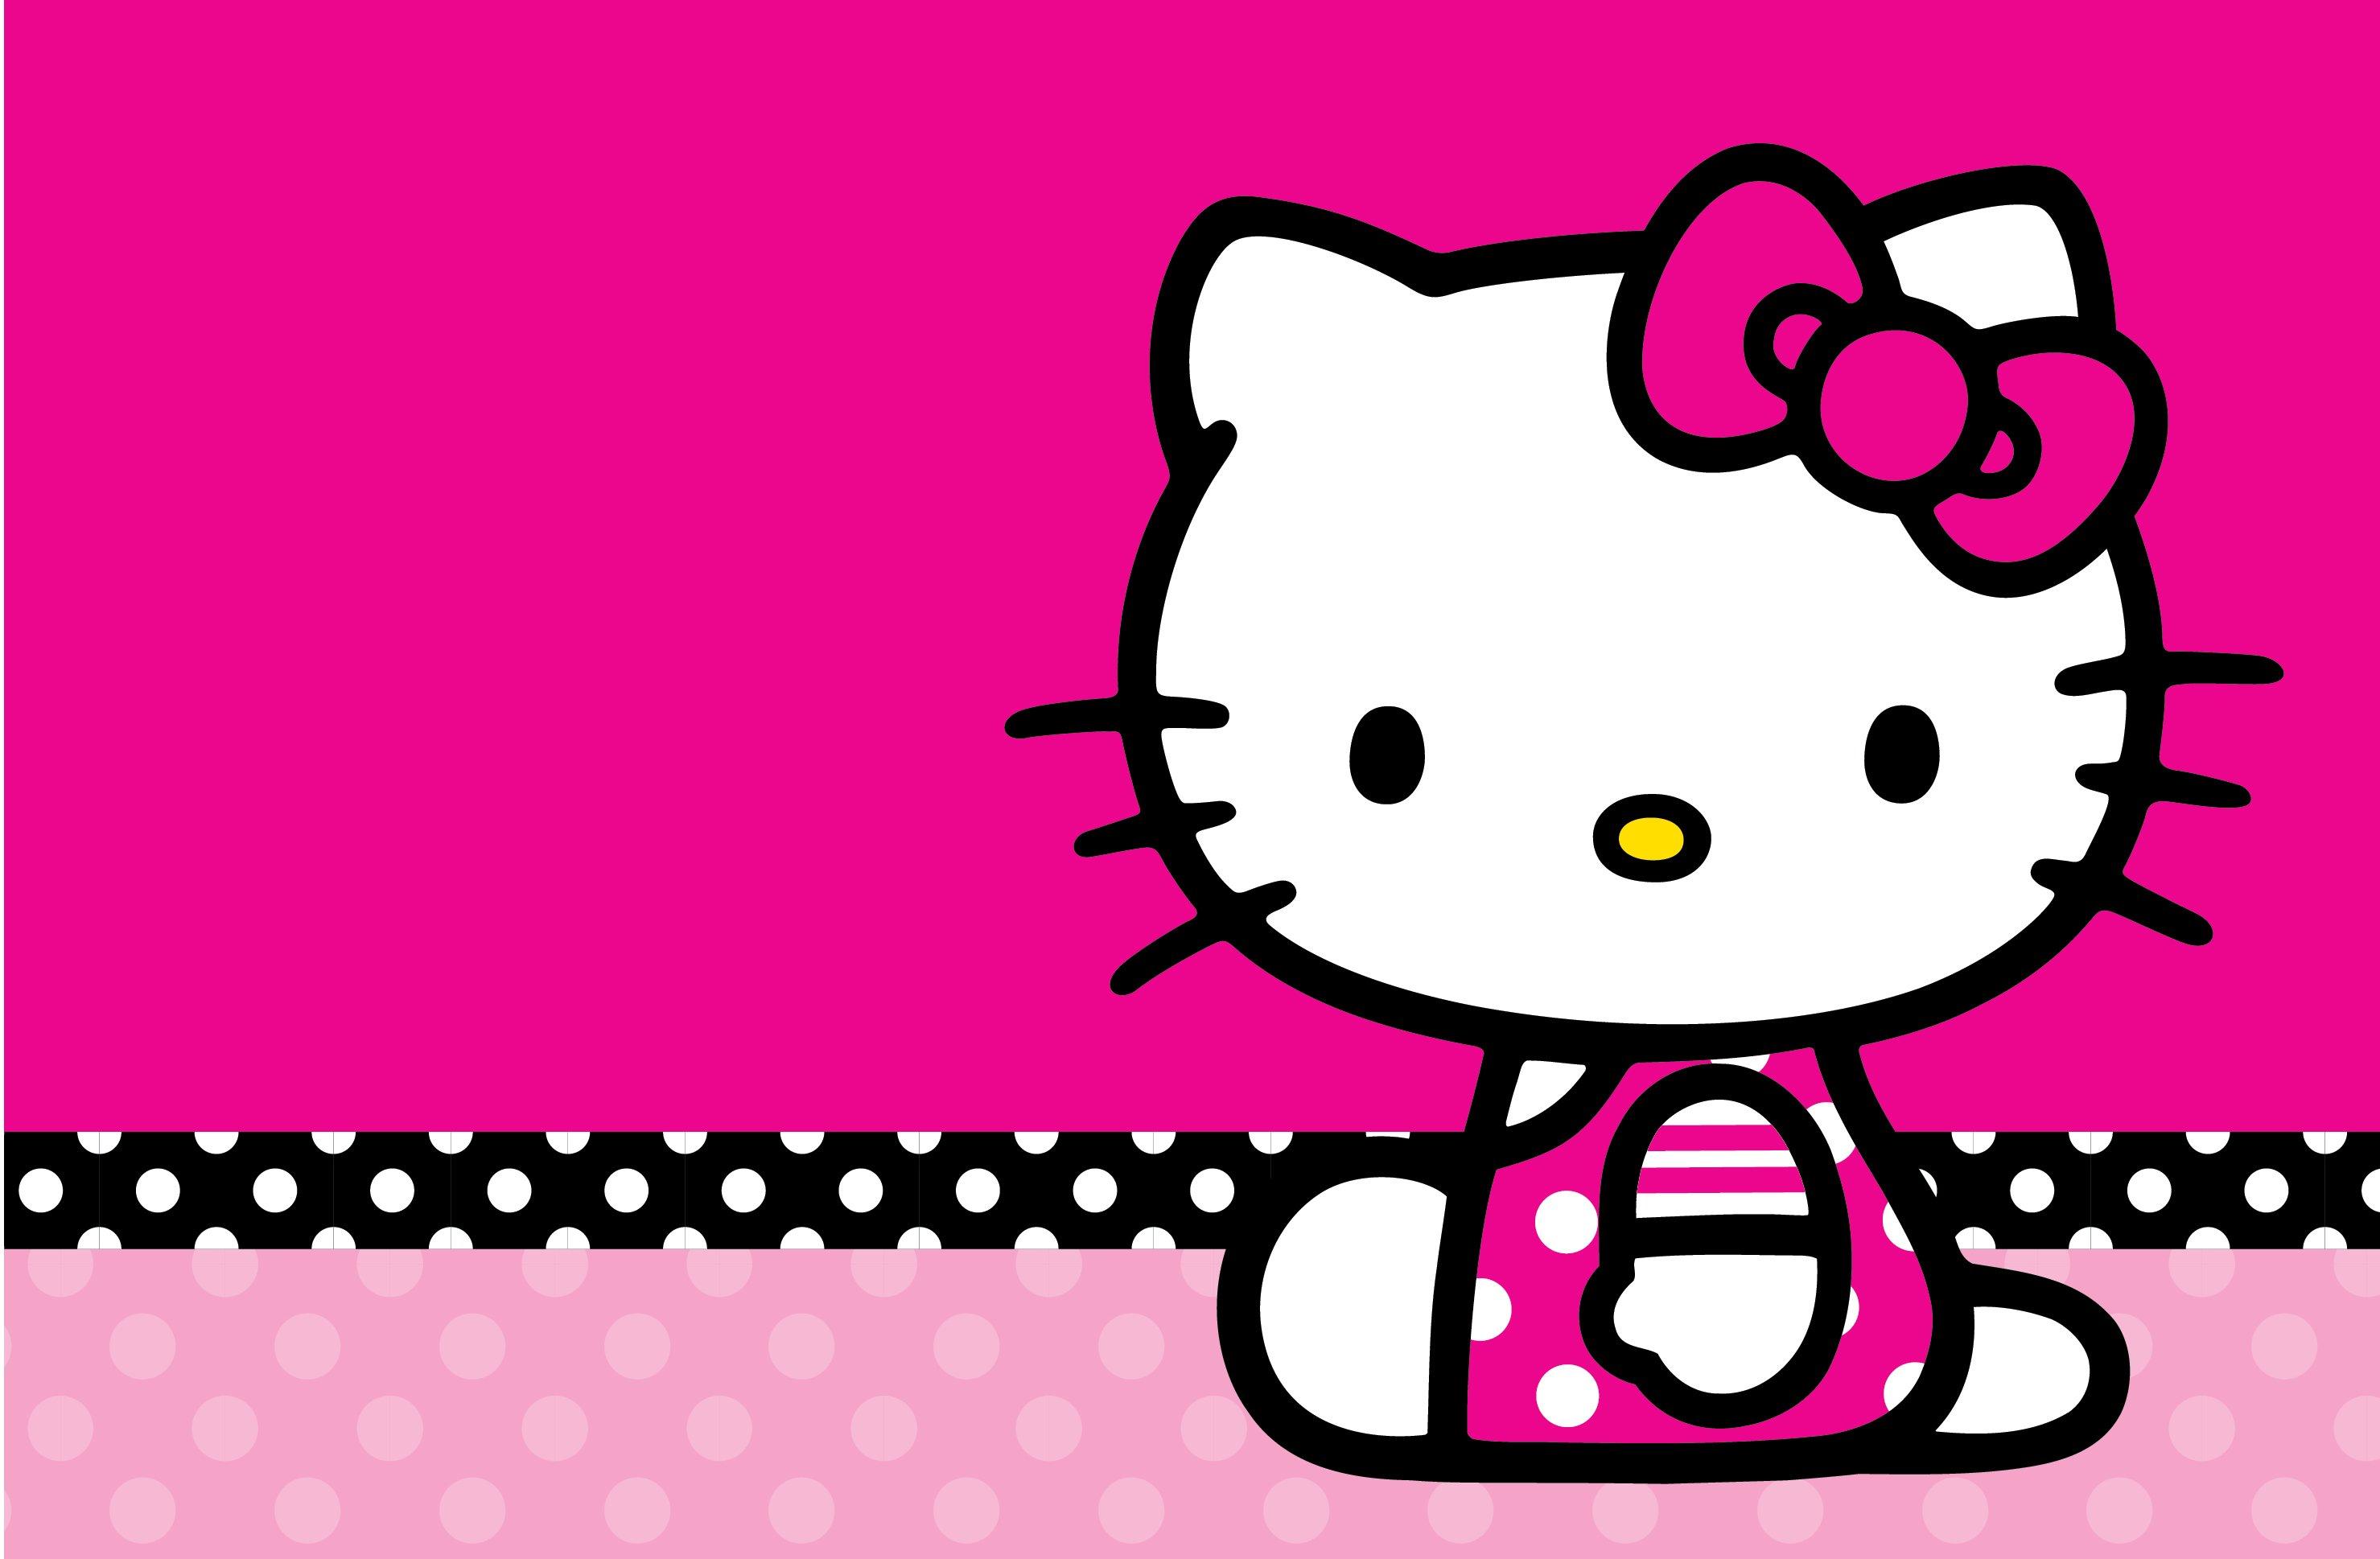 HELLO KITTY WHITE Cartoon Cat Cats Kitten Girl Girls 1hkitty